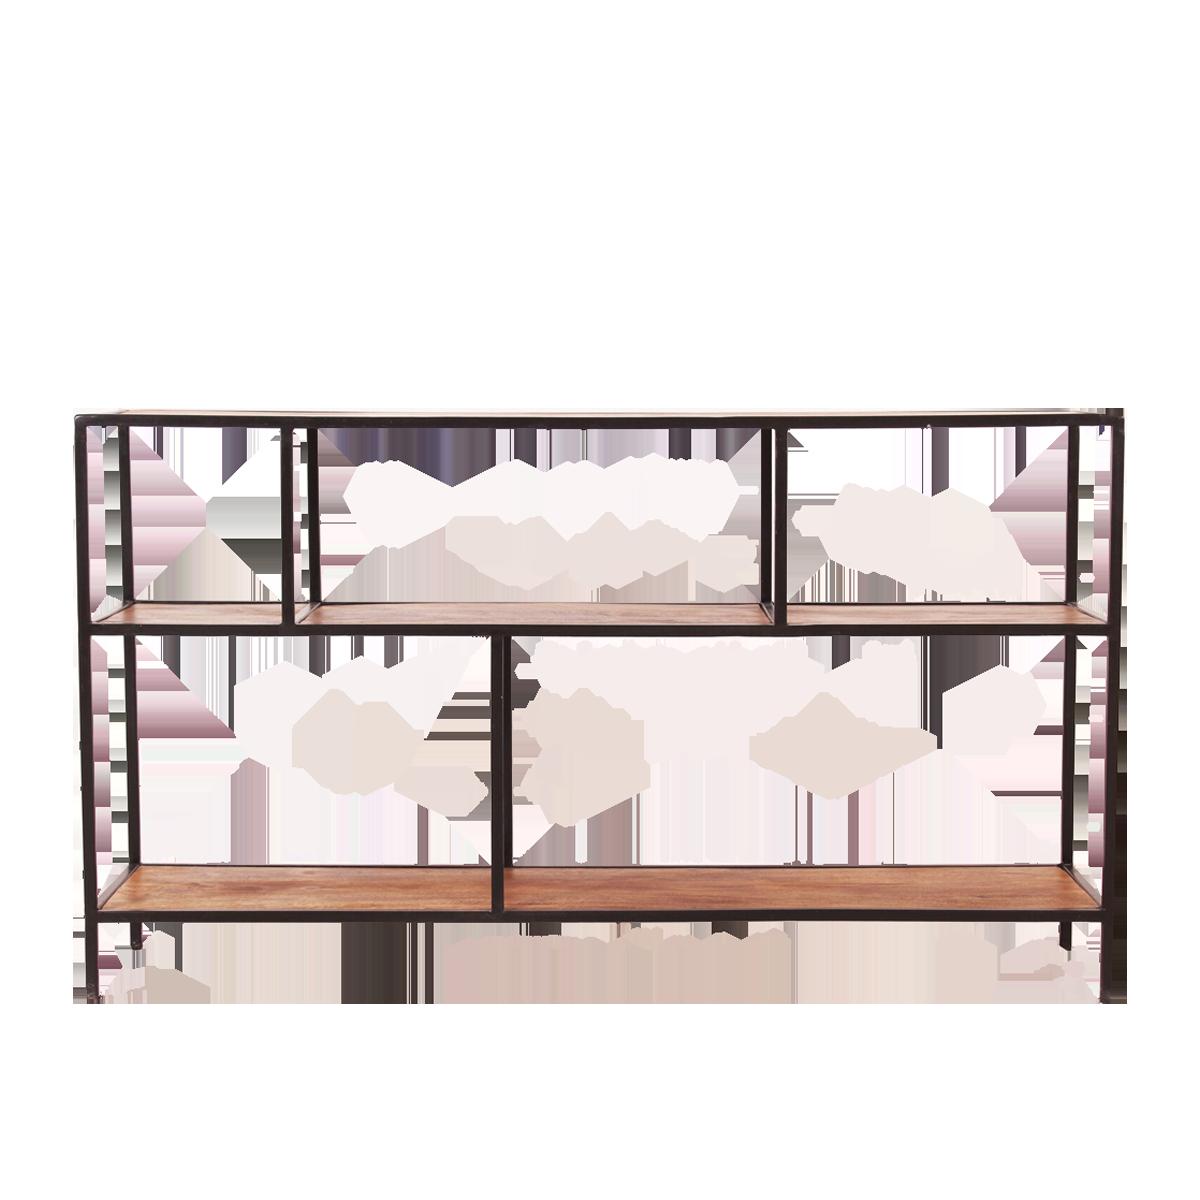 Full Size of Regal Industrie Aus Mangoholz Mit Altmetall String Regale 60 Cm Tief Grau Kinderzimmer Offenes Weiß Dachschräge Hifi Bito Berlin Moormann Regal Regal Industrie